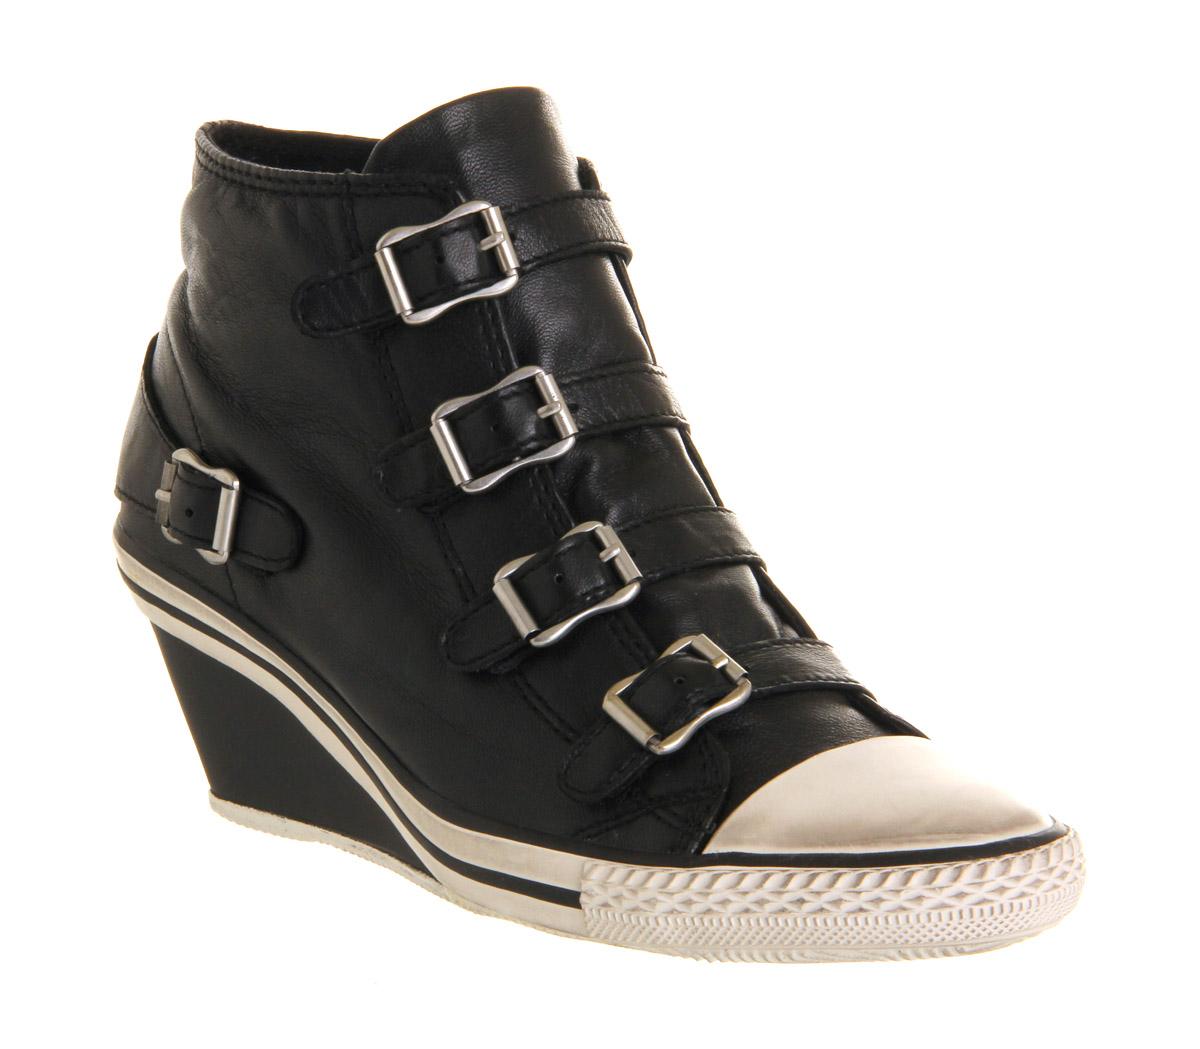 Model FlyLondonYossBlackAnkleBootsWomensShoes01jpg